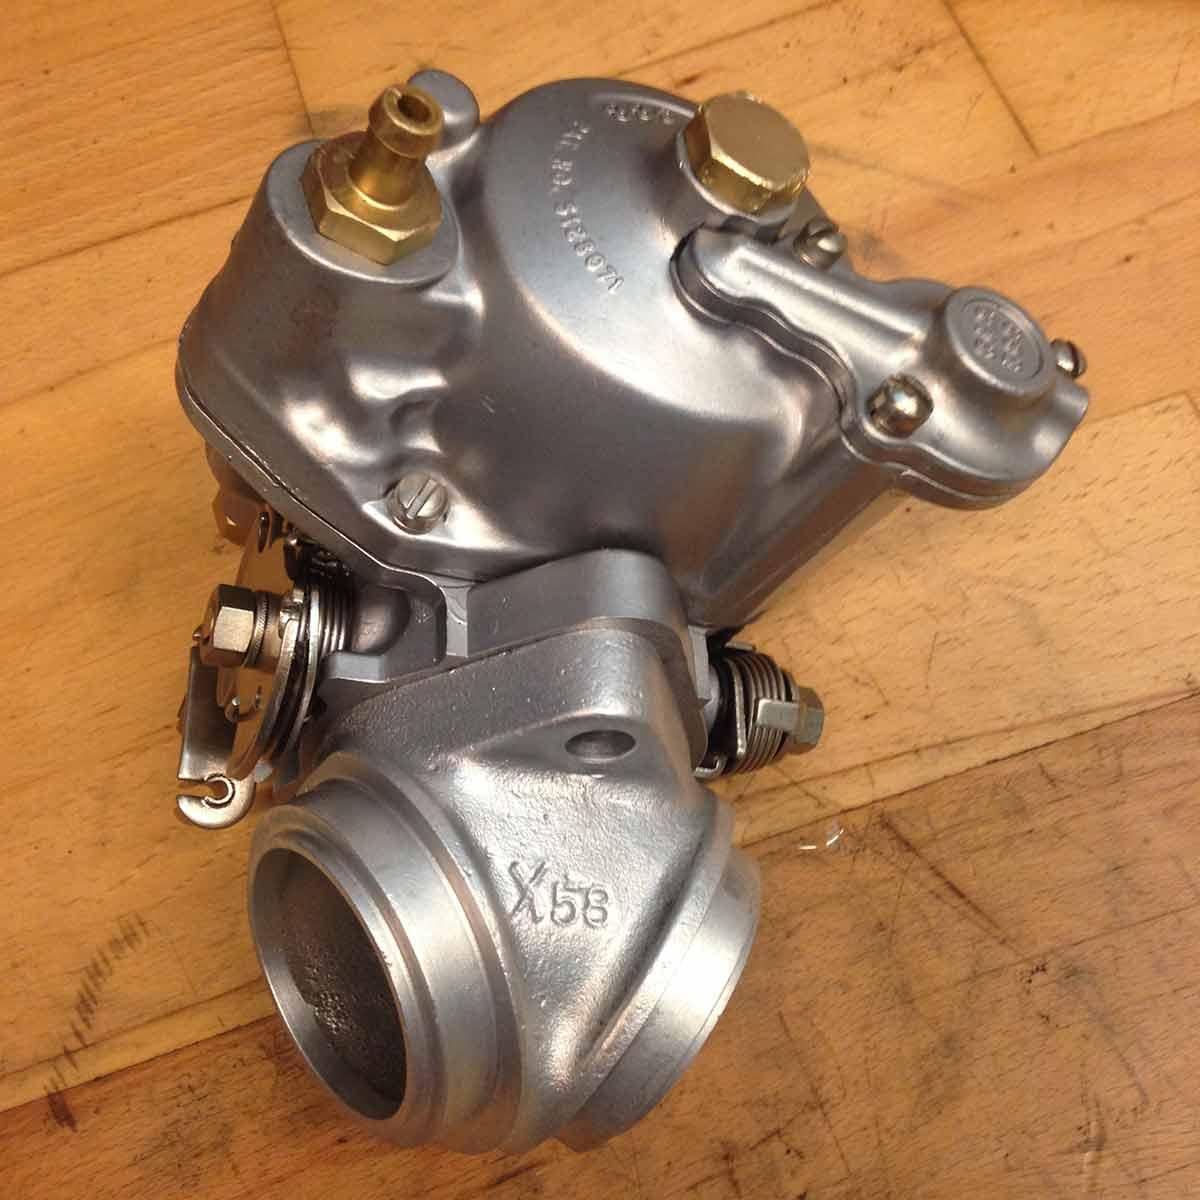 Harley Davidson S&S karburator - Efter Aquanife vandpolering